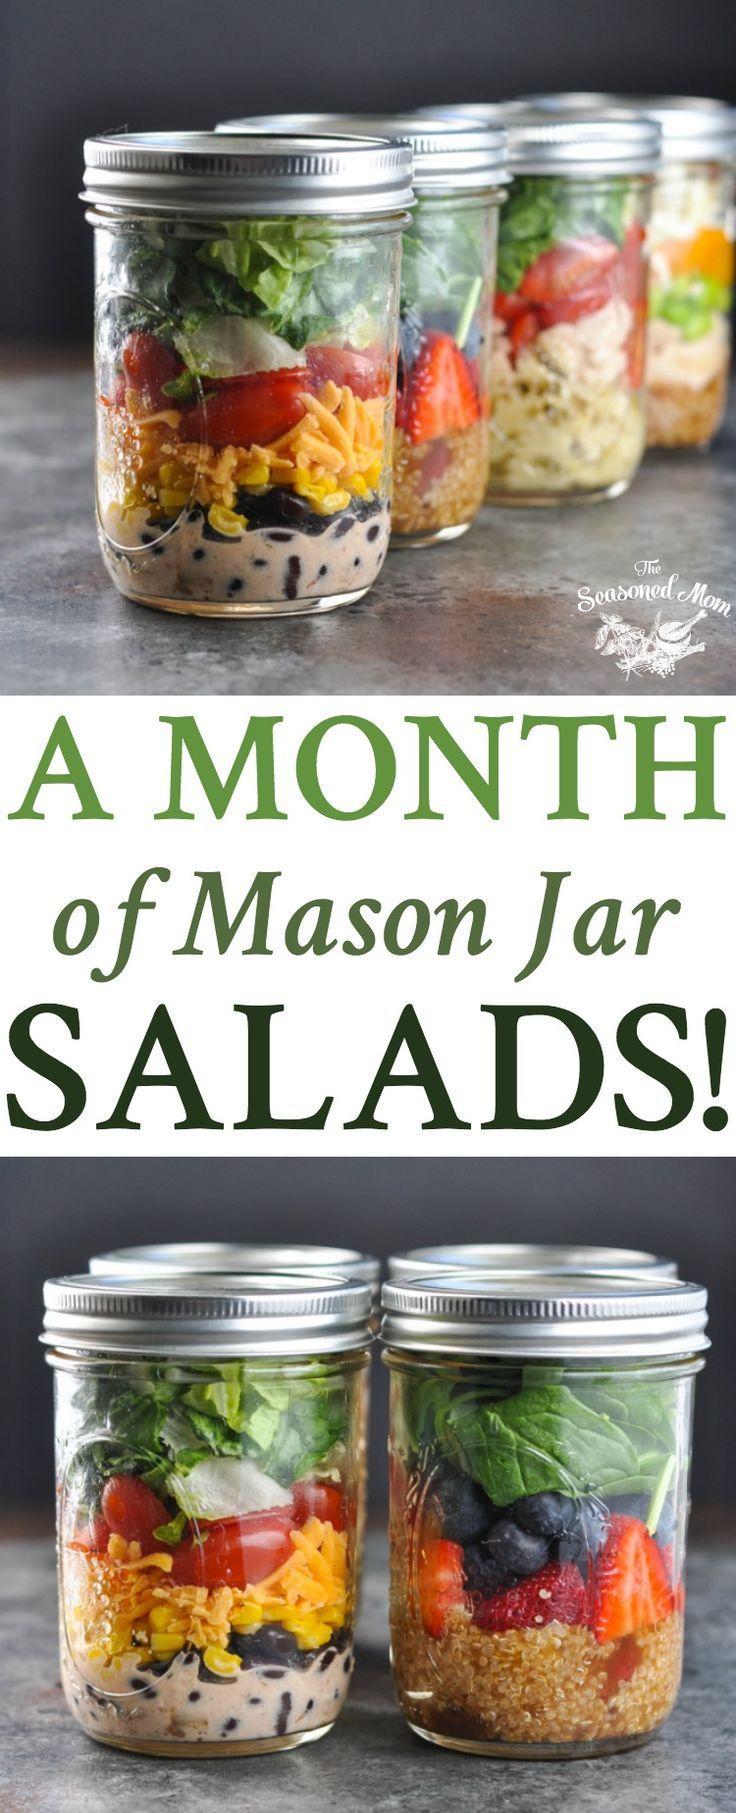 A Month of Mason Jar Salads! Meal Prep | Salad Recipes | Meal Prep for the Week | Meal Prep Recipes | Healthy Lunch Recipes | Lunch Ideas | Healthy Recipes | Healthy Dinner Recipes | Mason Jar Meals